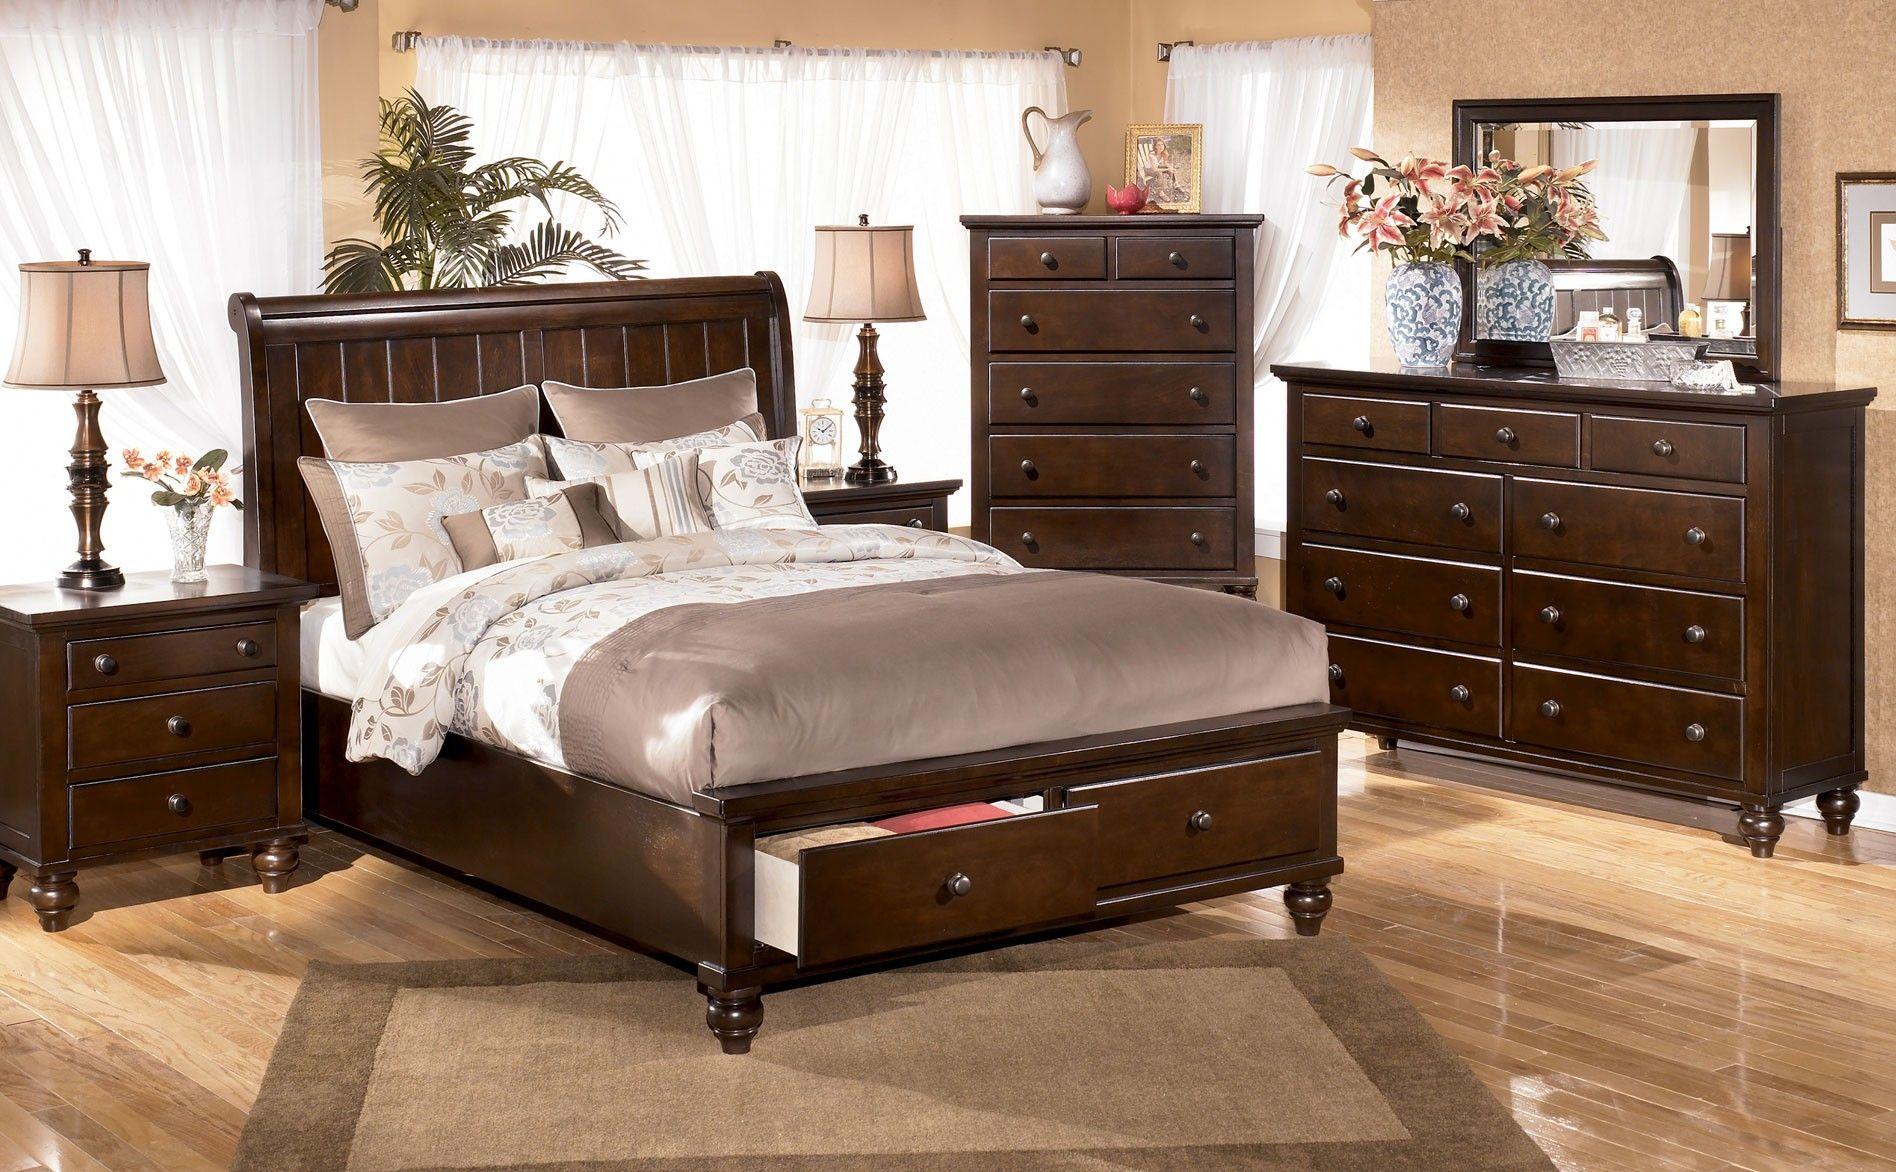 ashley camdyn king sleigh bedroom group with storage